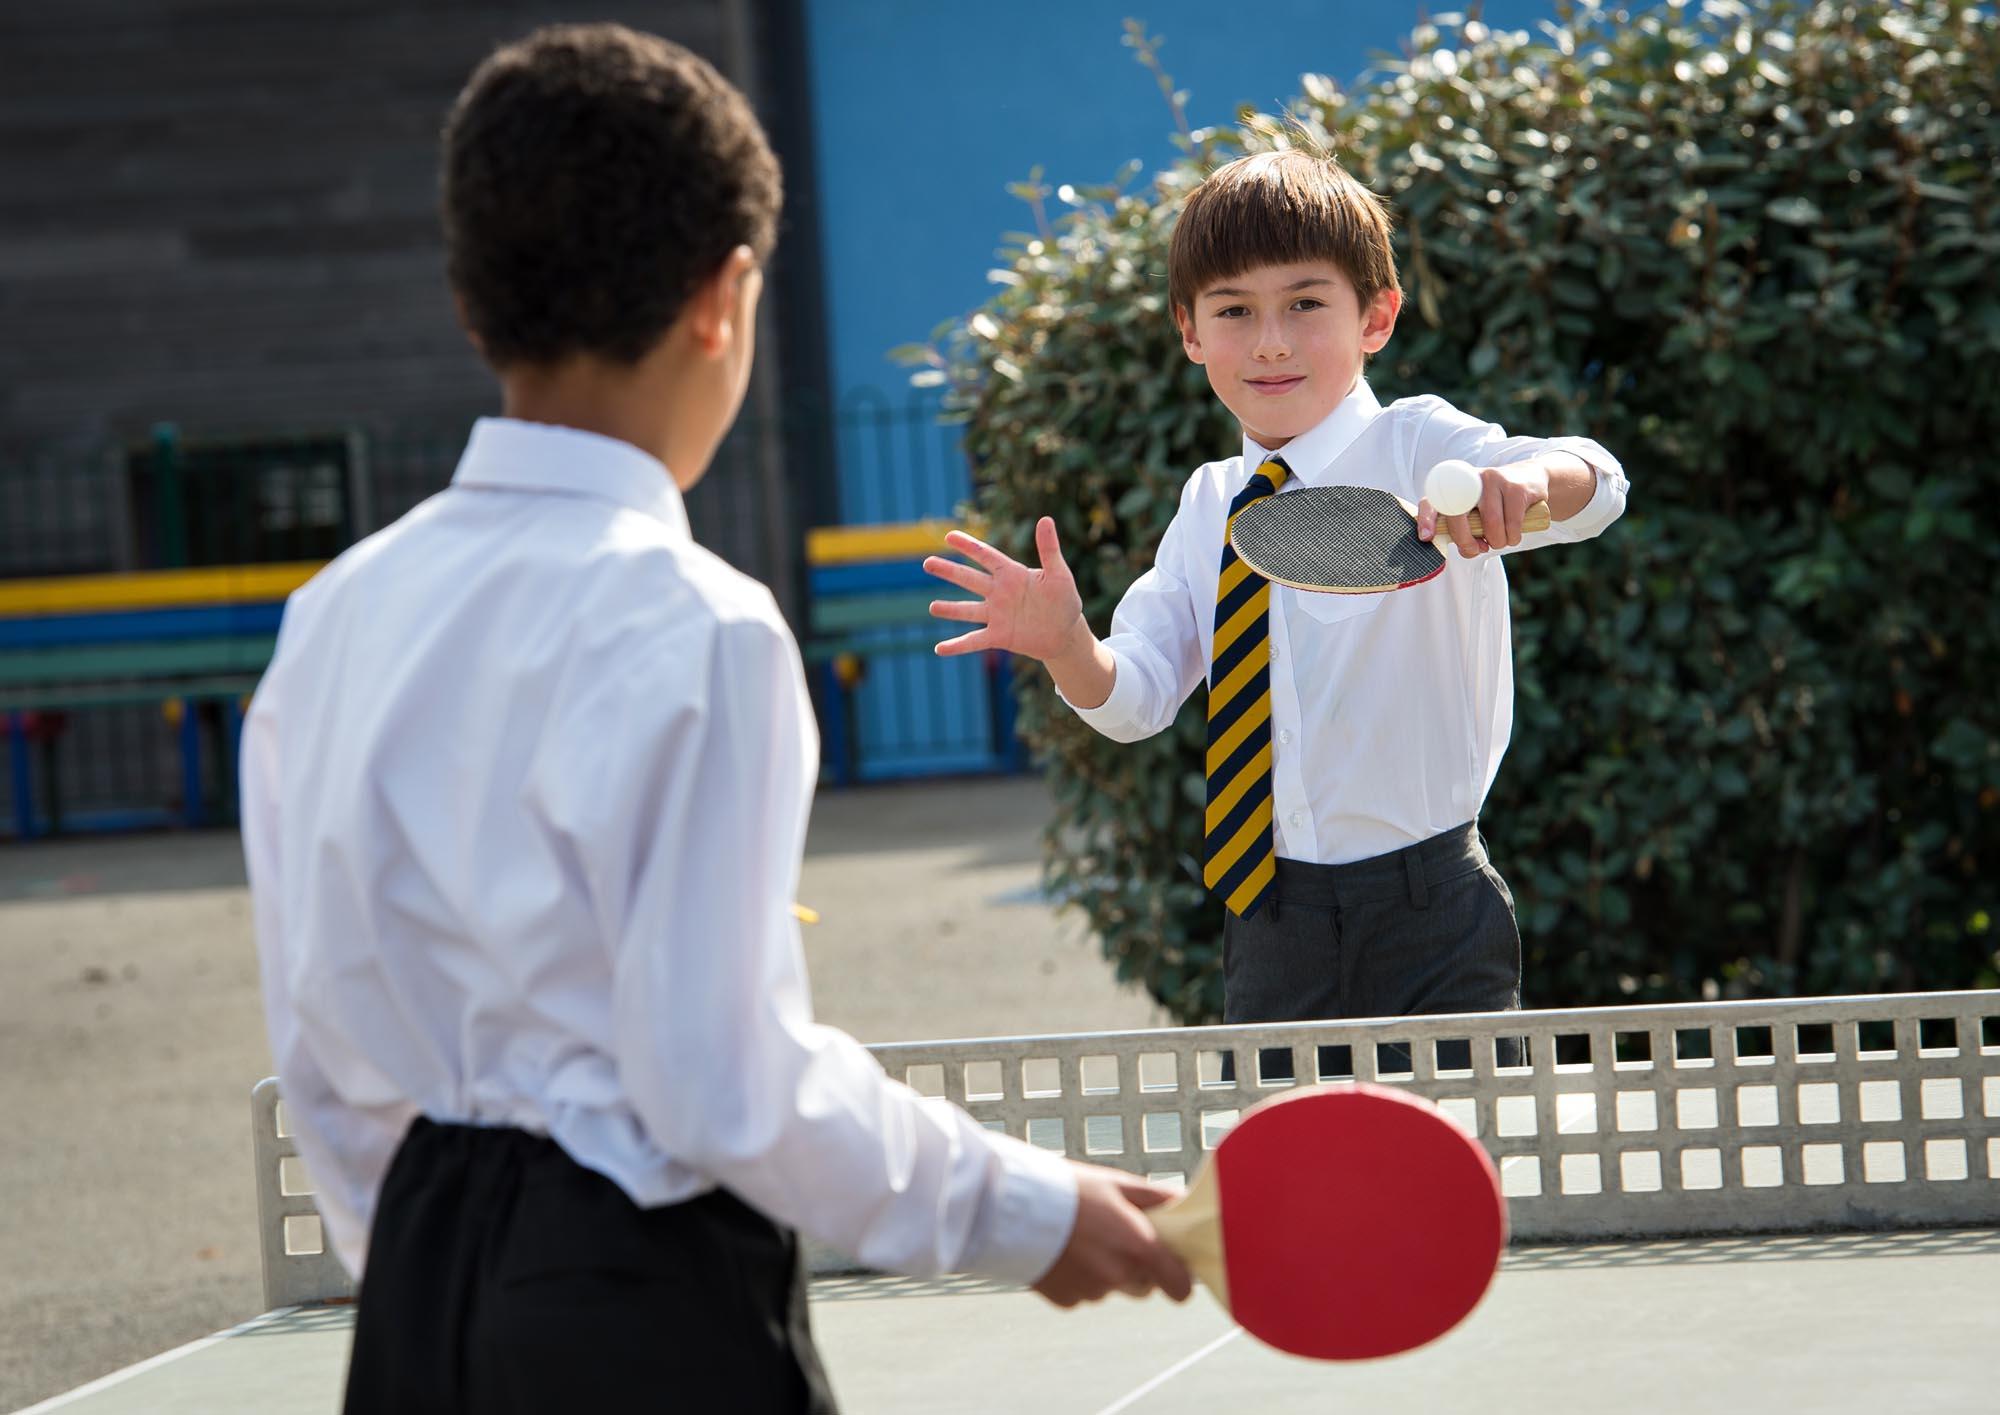 Boys playing table tennis